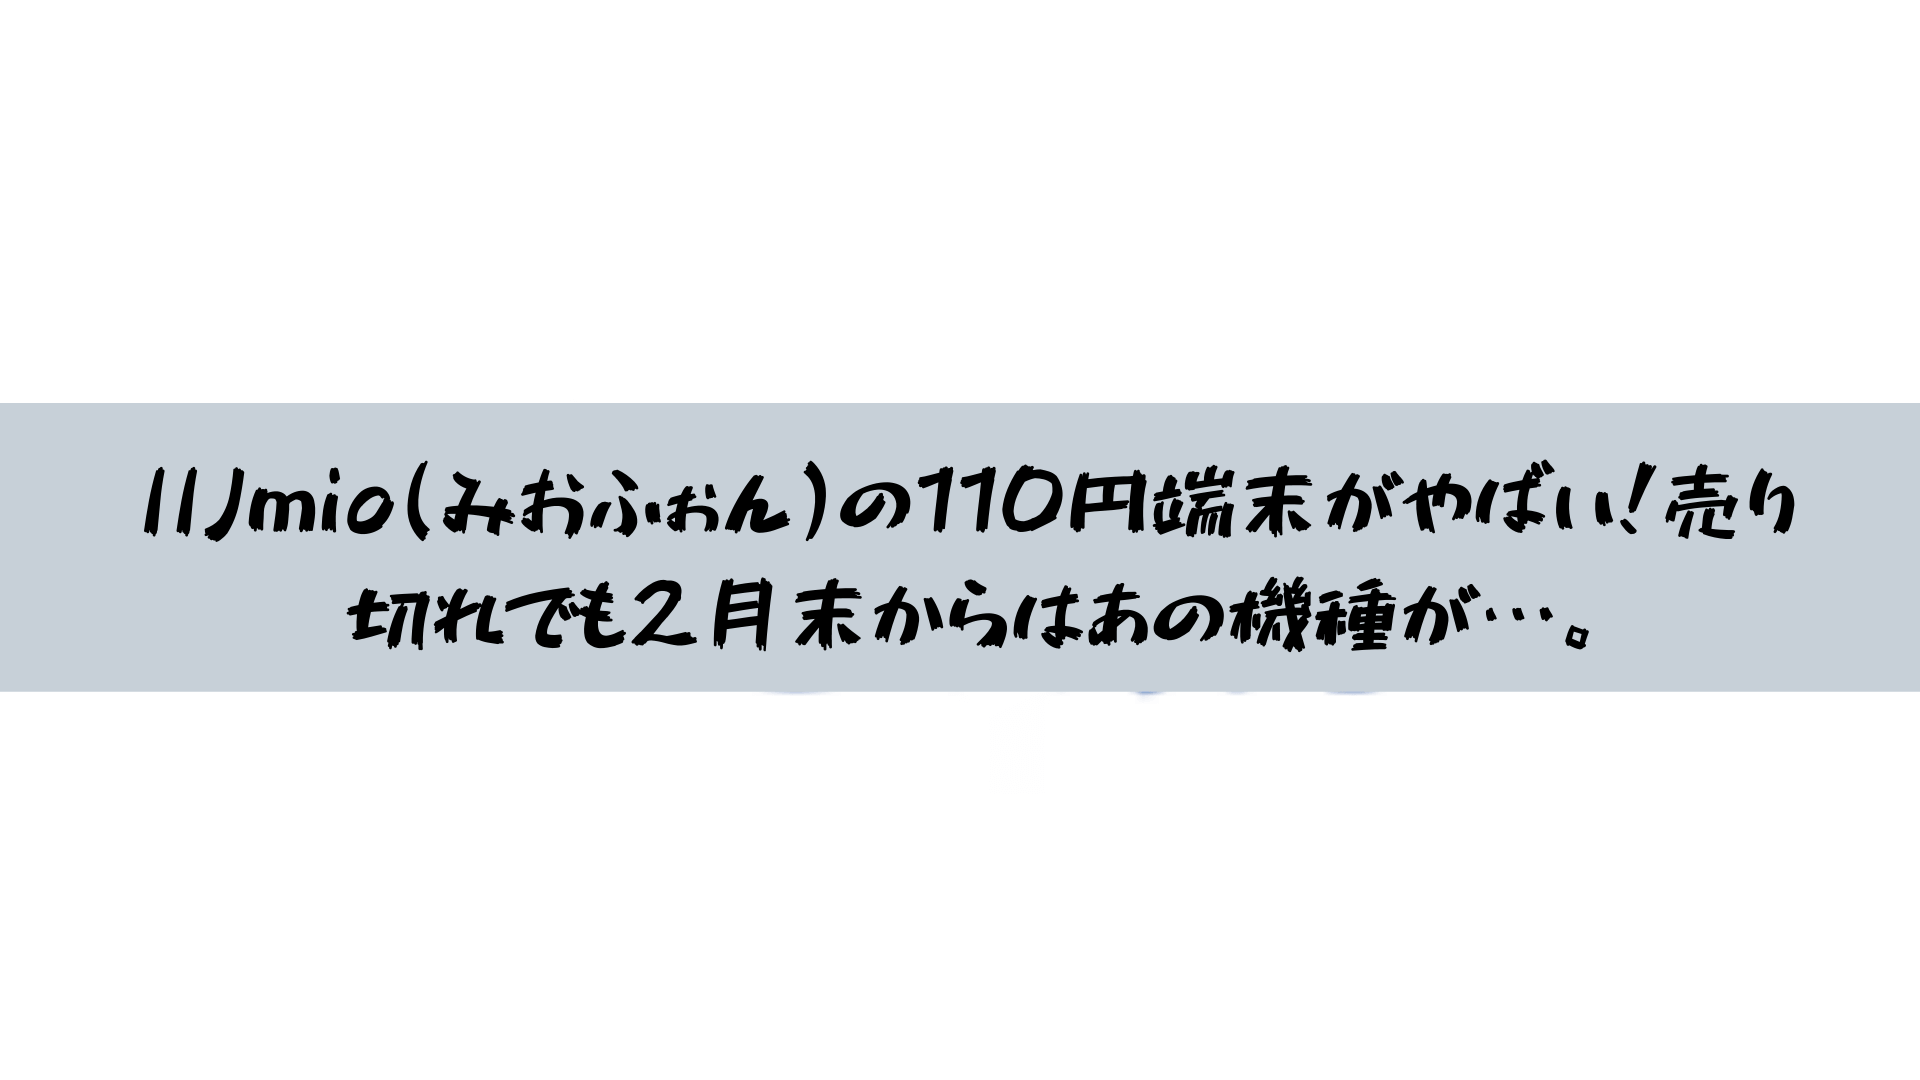 IIJmio(みおふぉん)の100円端末がやばい!売り切れでも2月末からはあの機種が…。